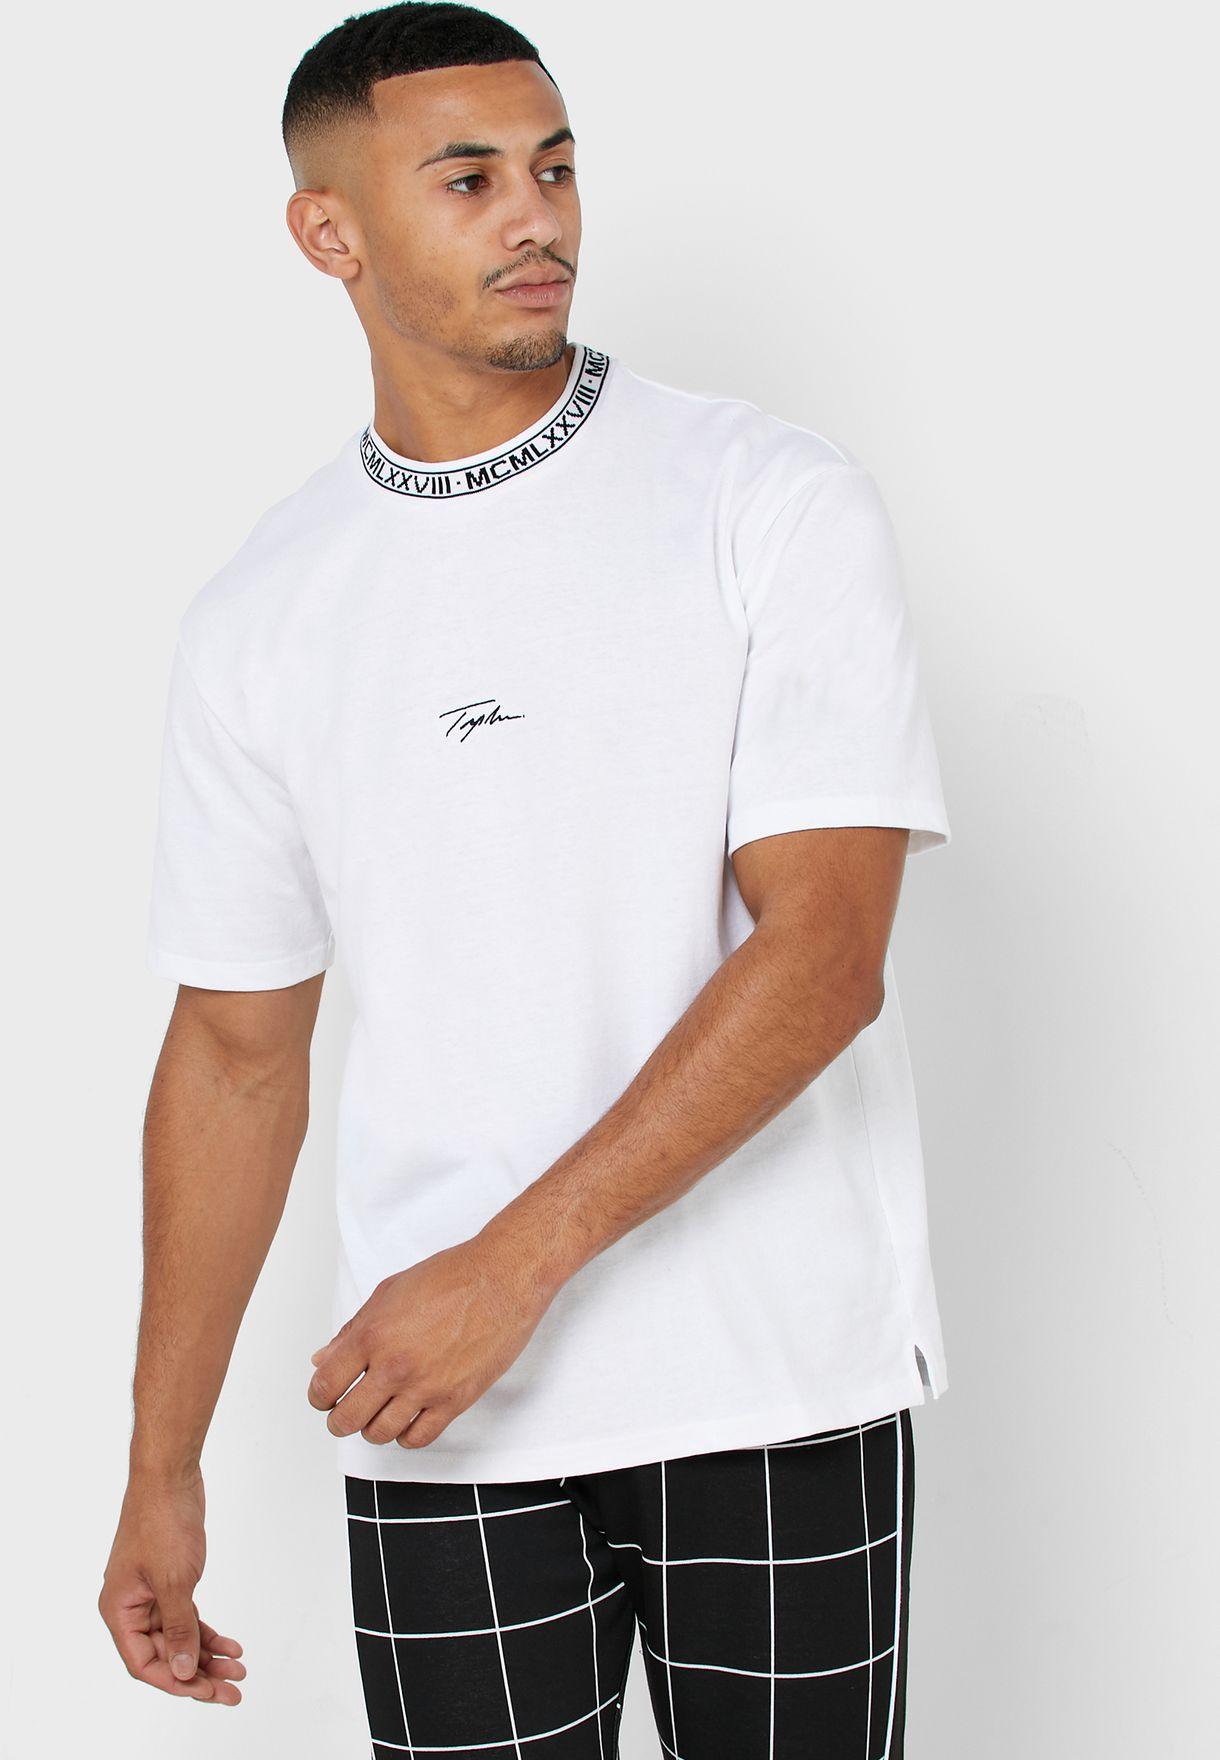 Jacquard Ribbed Crew Neck T-Shirt